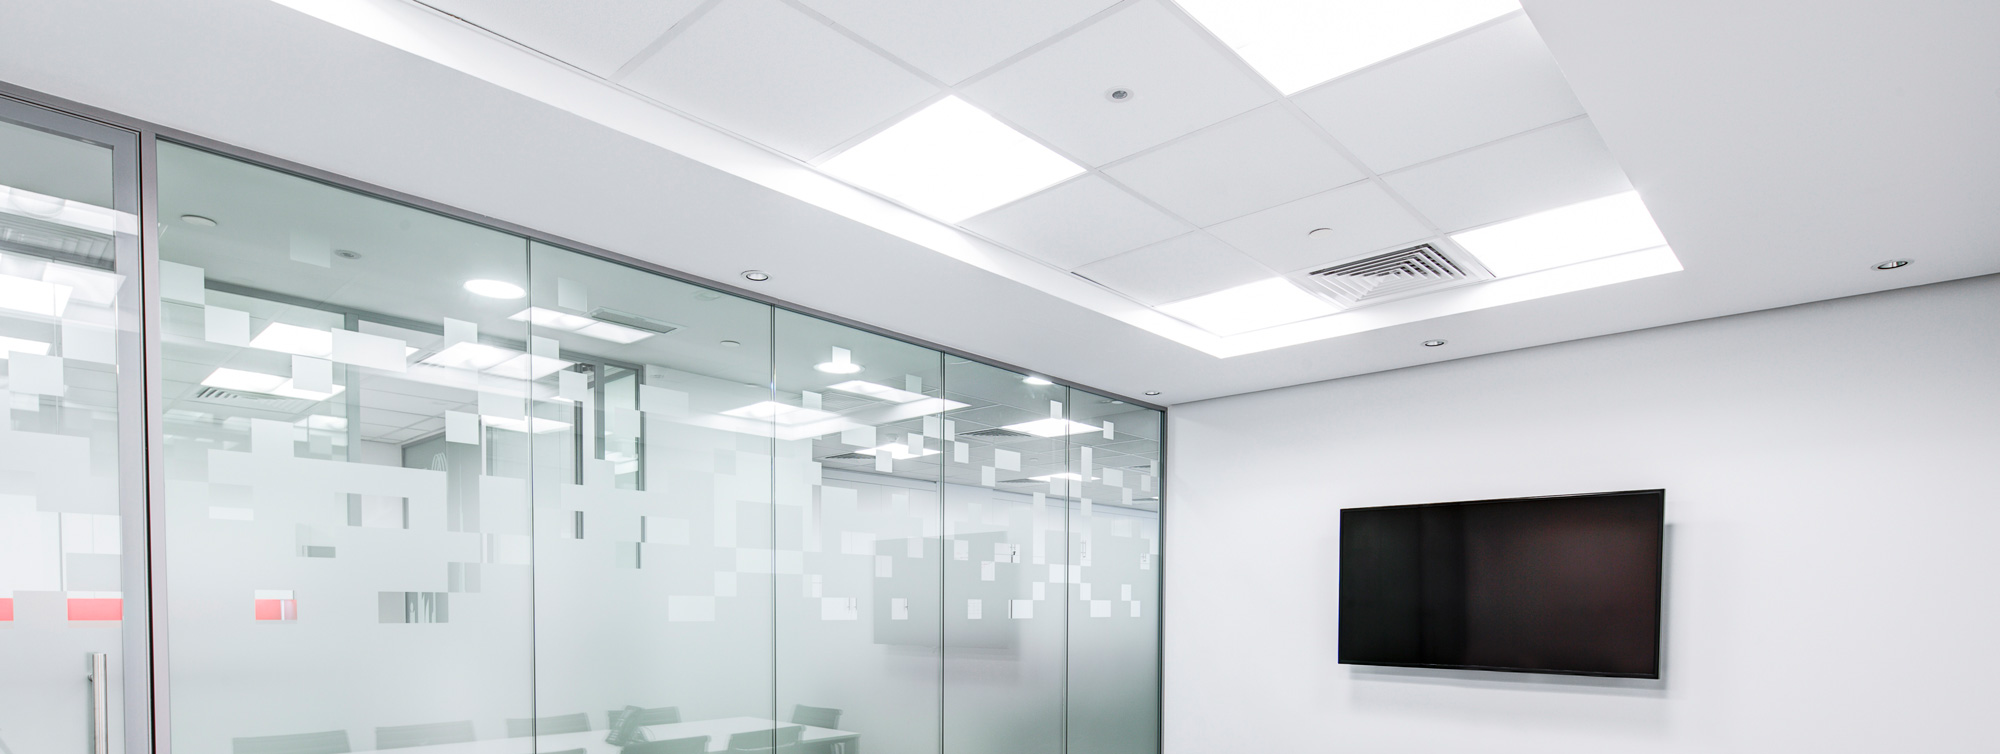 ambientato pannelli led illuminazione led logicsun